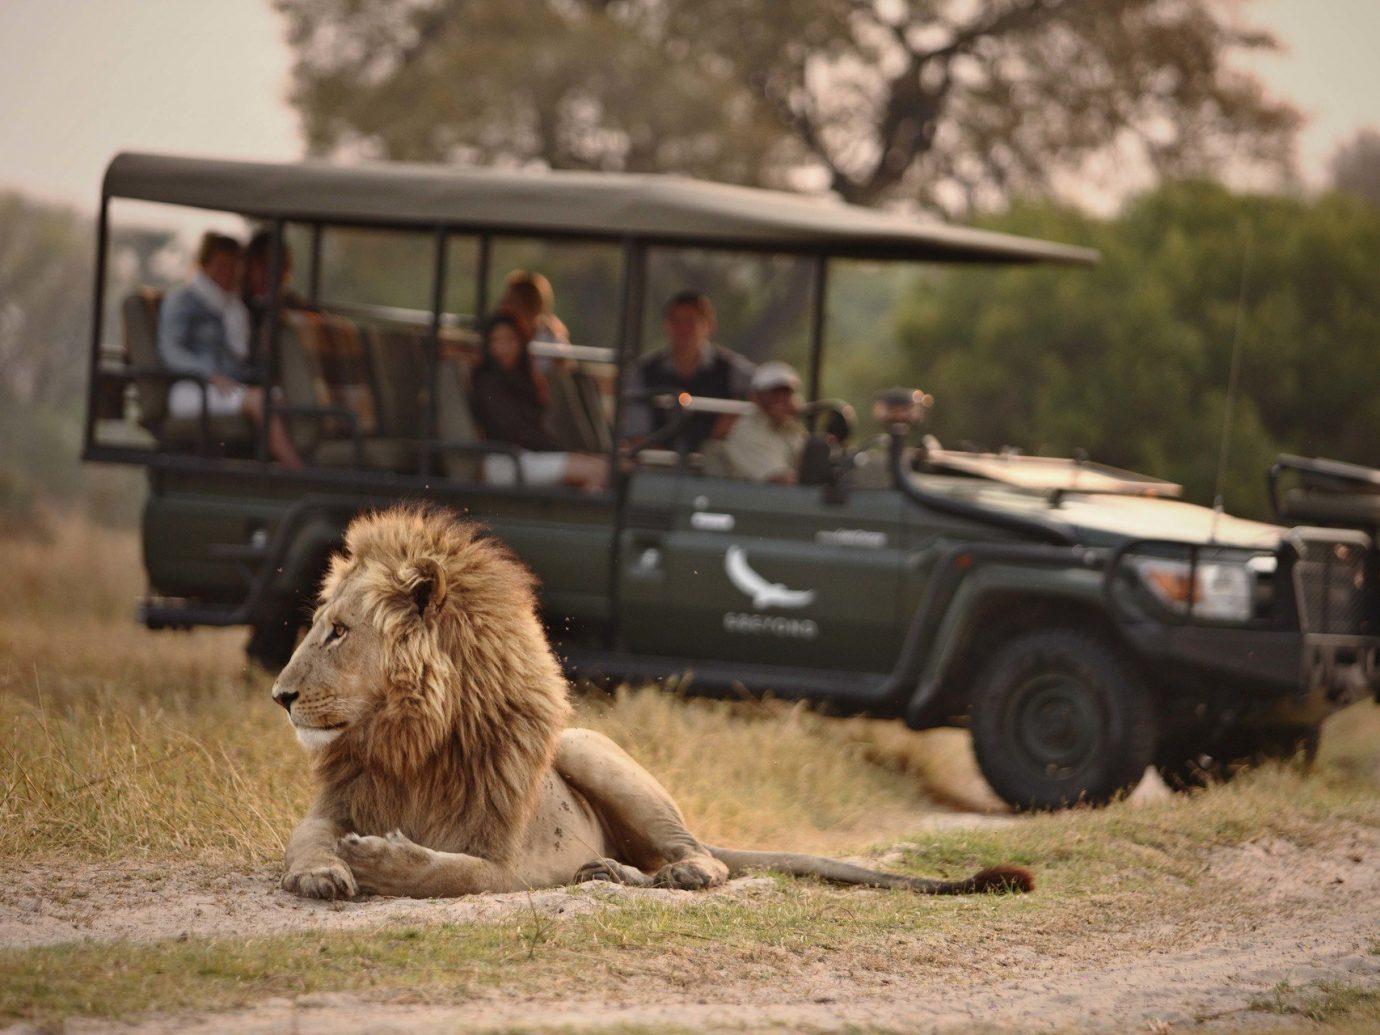 Hotels grass outdoor tree mammal Safari military vehicle off roading